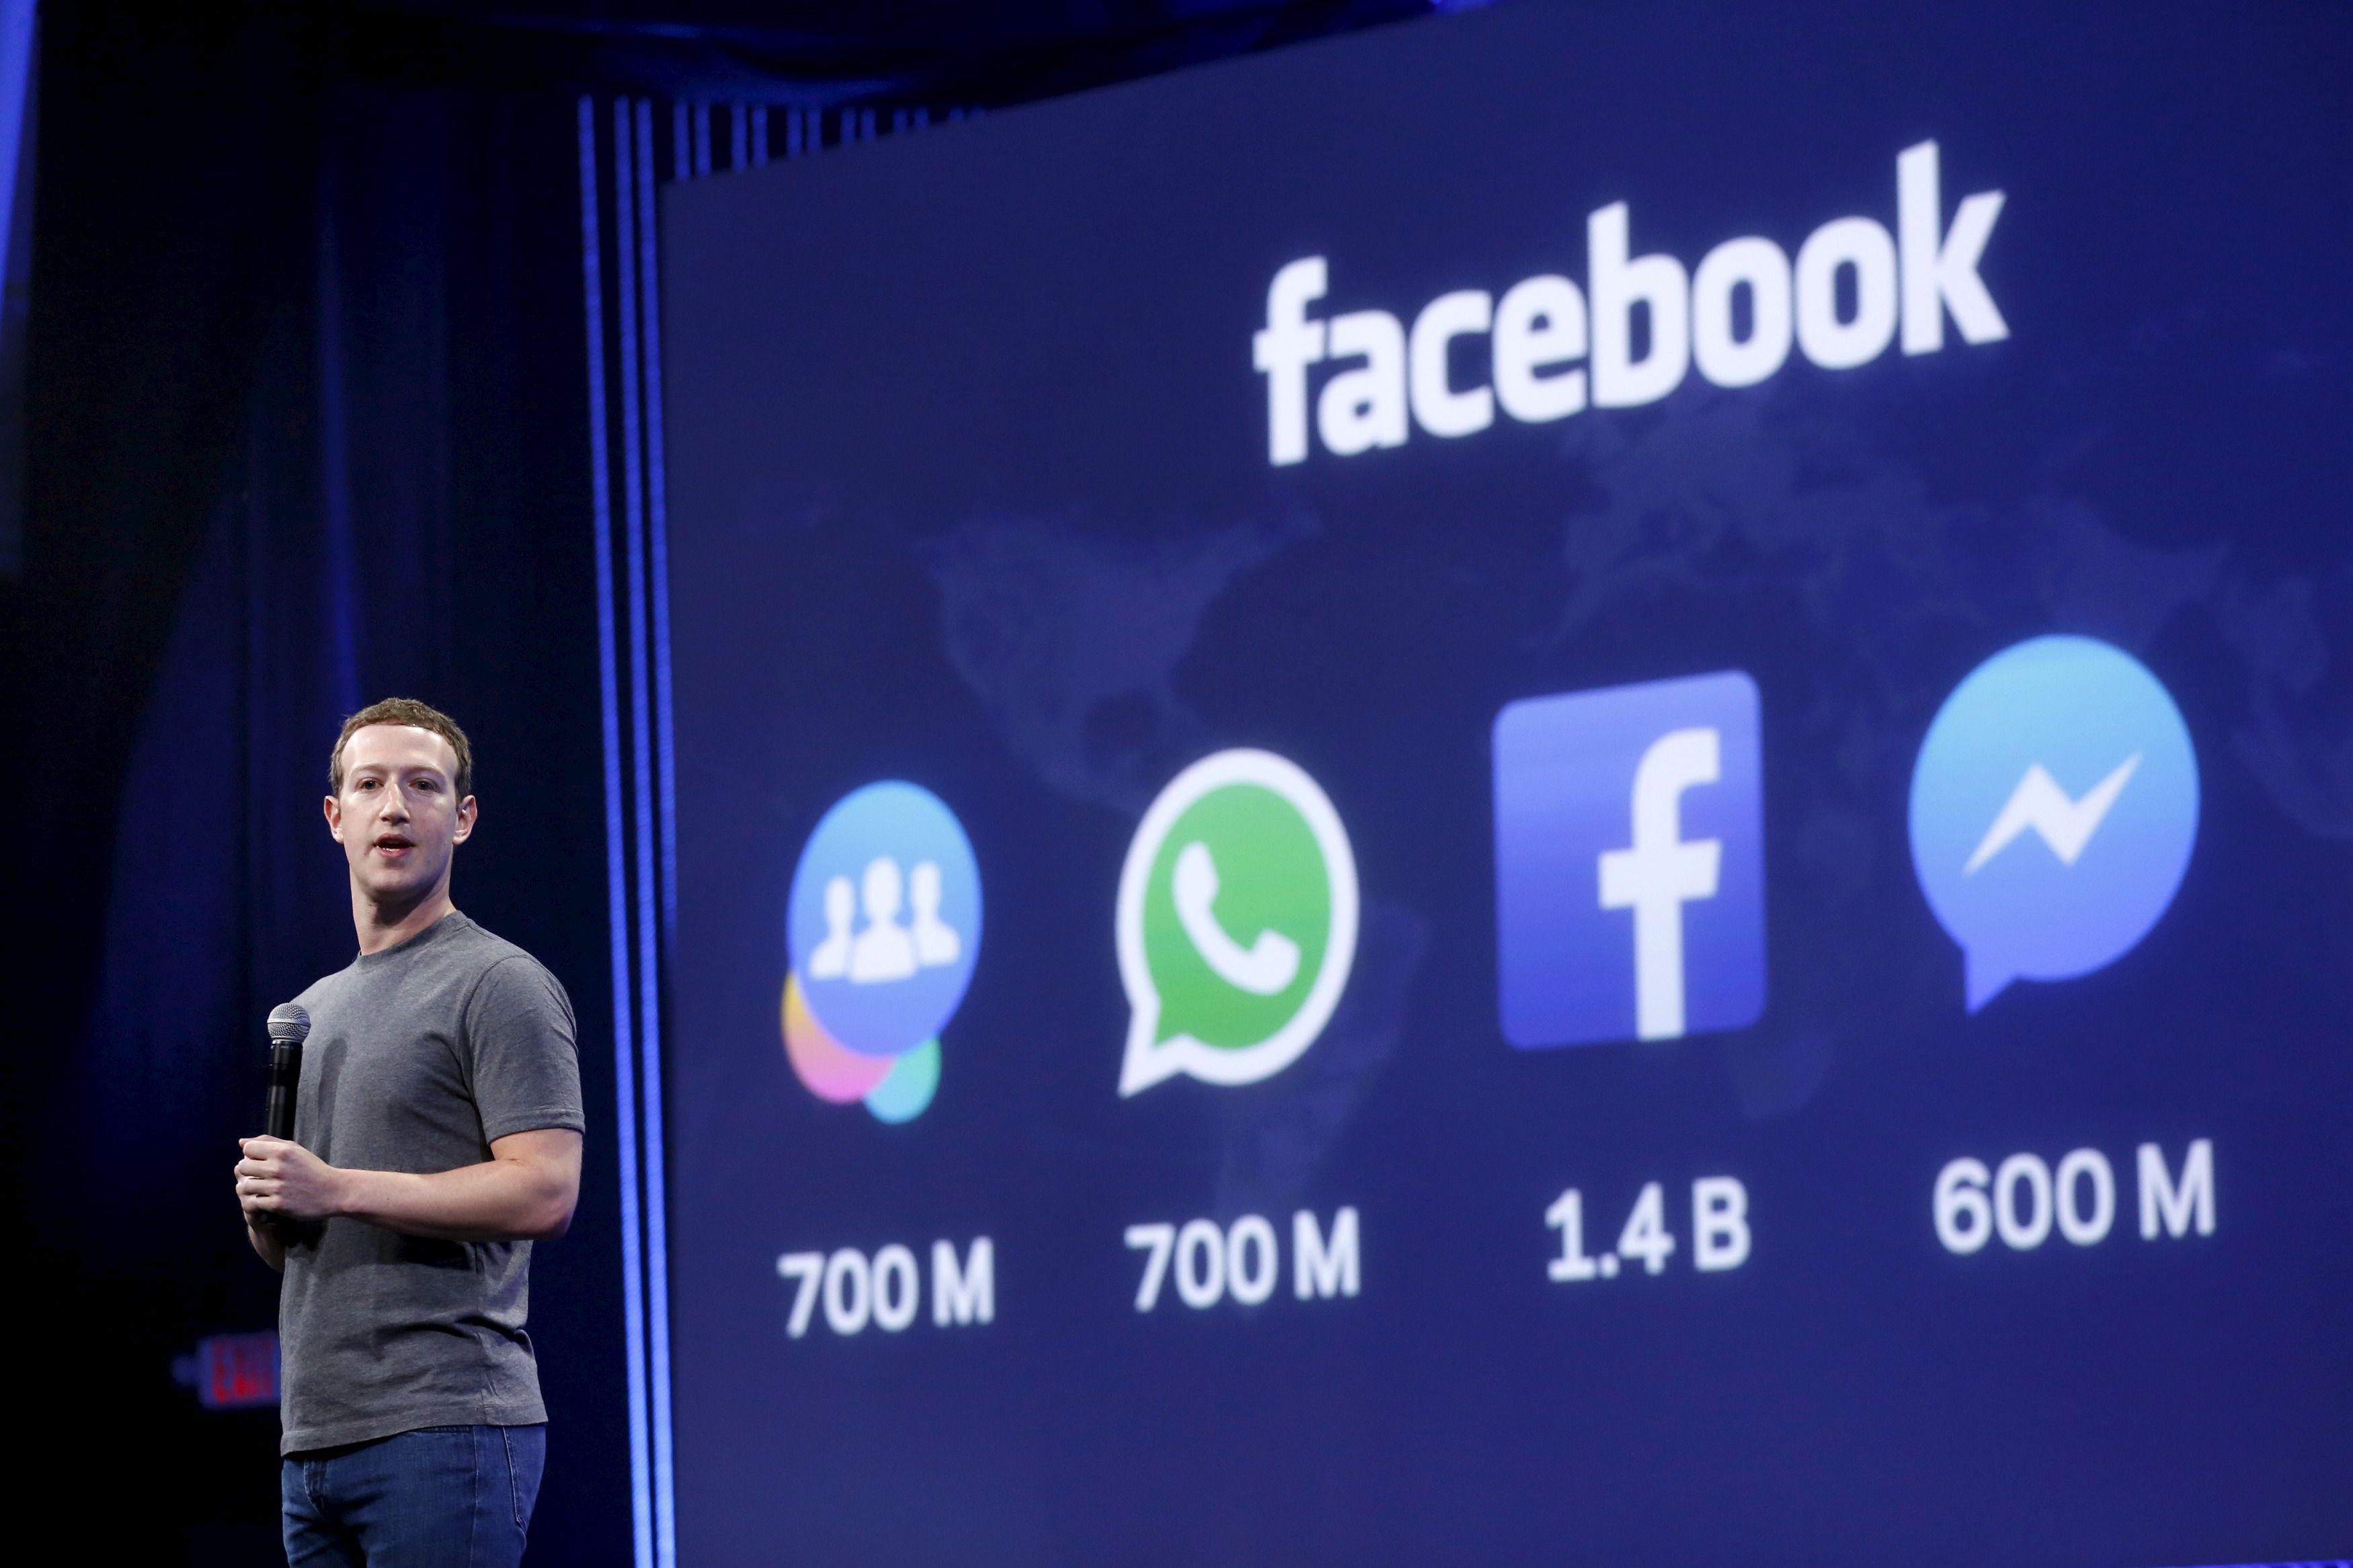 Facebook CEO Mark Zuckerberg speaks during his keynote address at Facebook F8 in San Francisco, California March 25, 2015. REUTERS/Robert Galbraith - RTR4UUTV